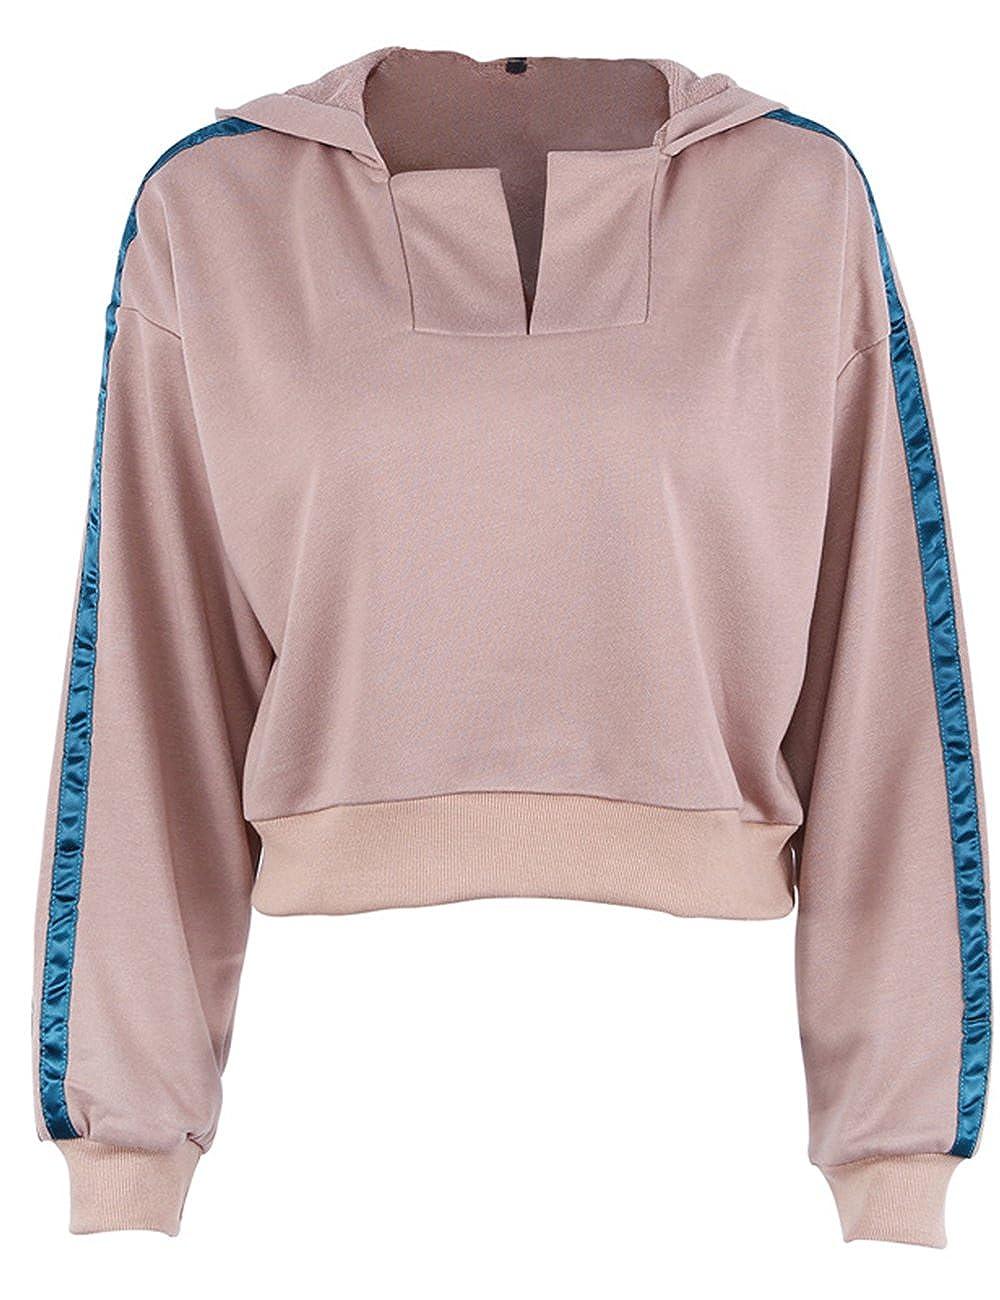 Womens Striped Side Crop Top Sweashirt Pullover Long Sleeve Fashion Street Cropped Jumper Hoodie